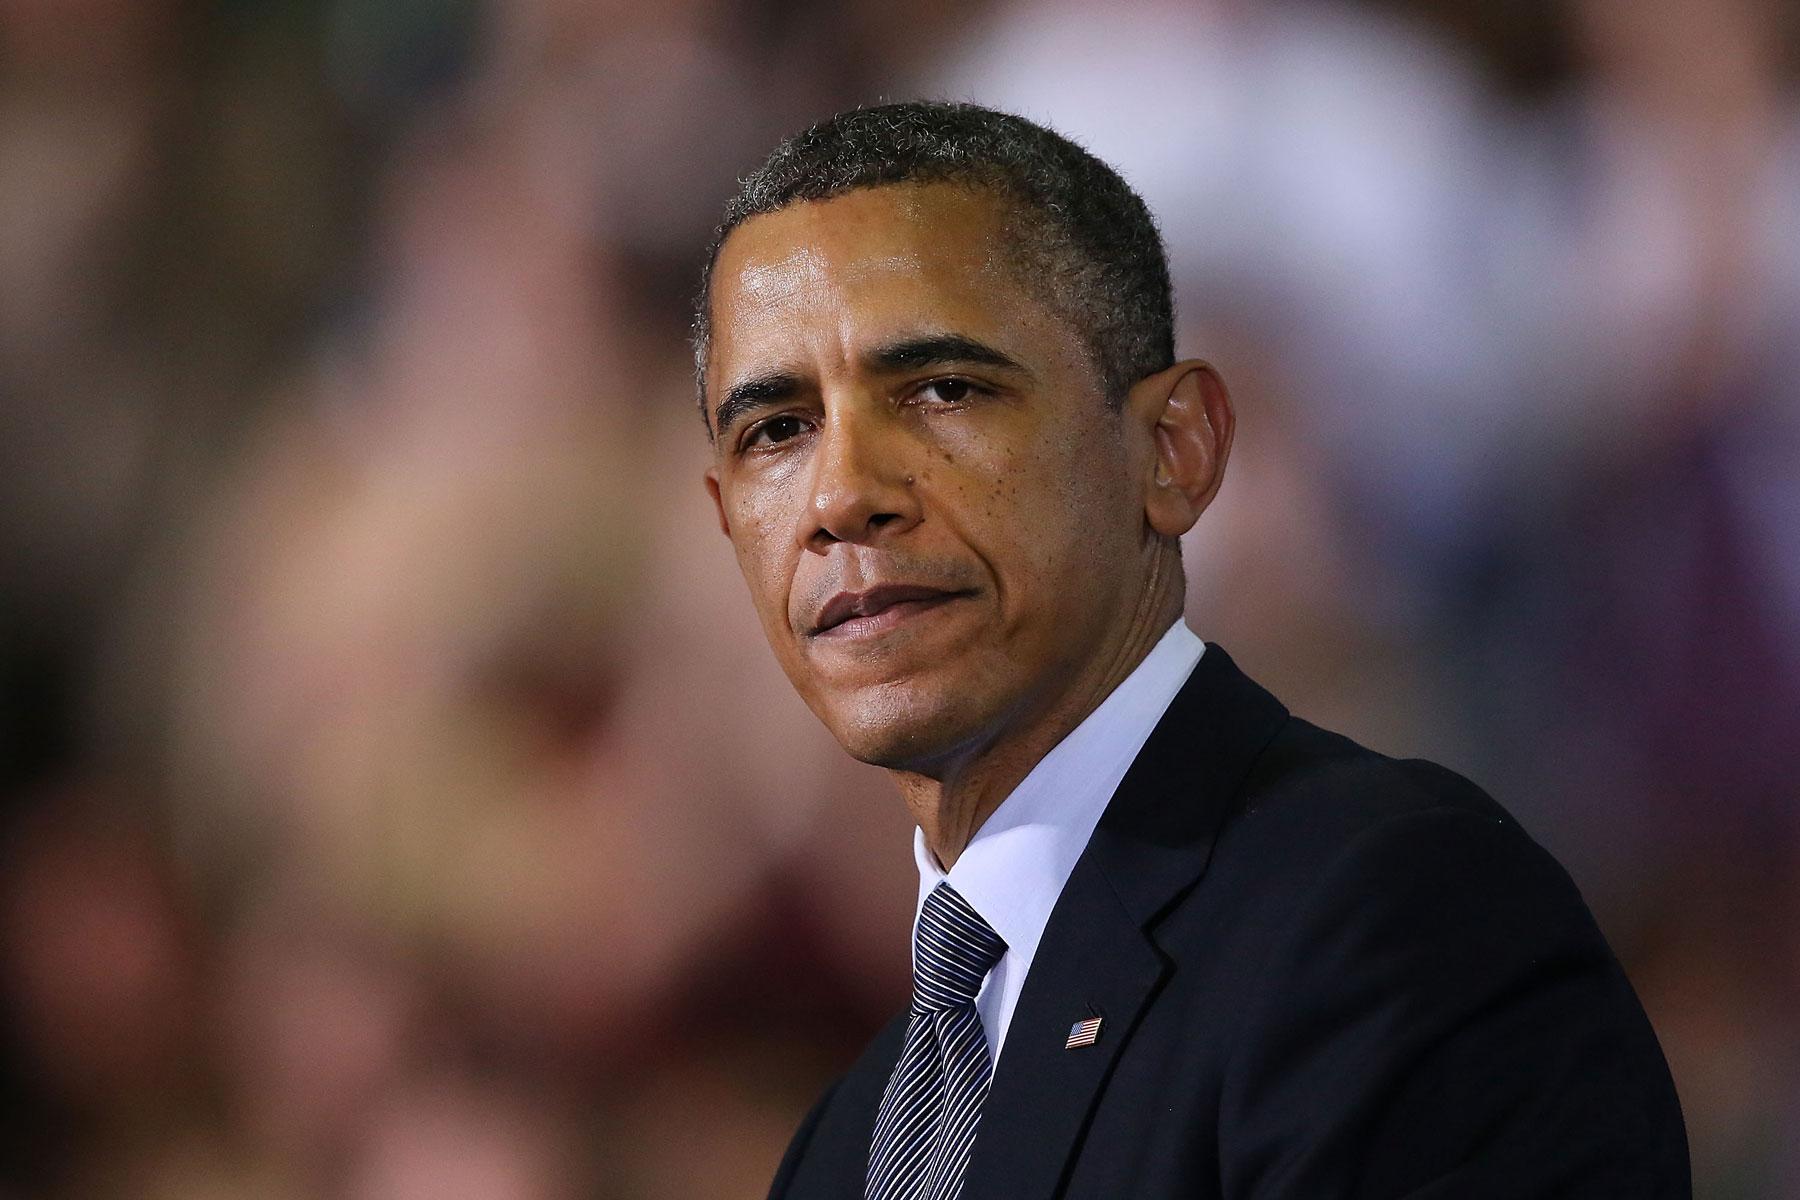 Obama: Zach Galifianakis Was 'Pretty Nervous' on 'Between Two Ferns'